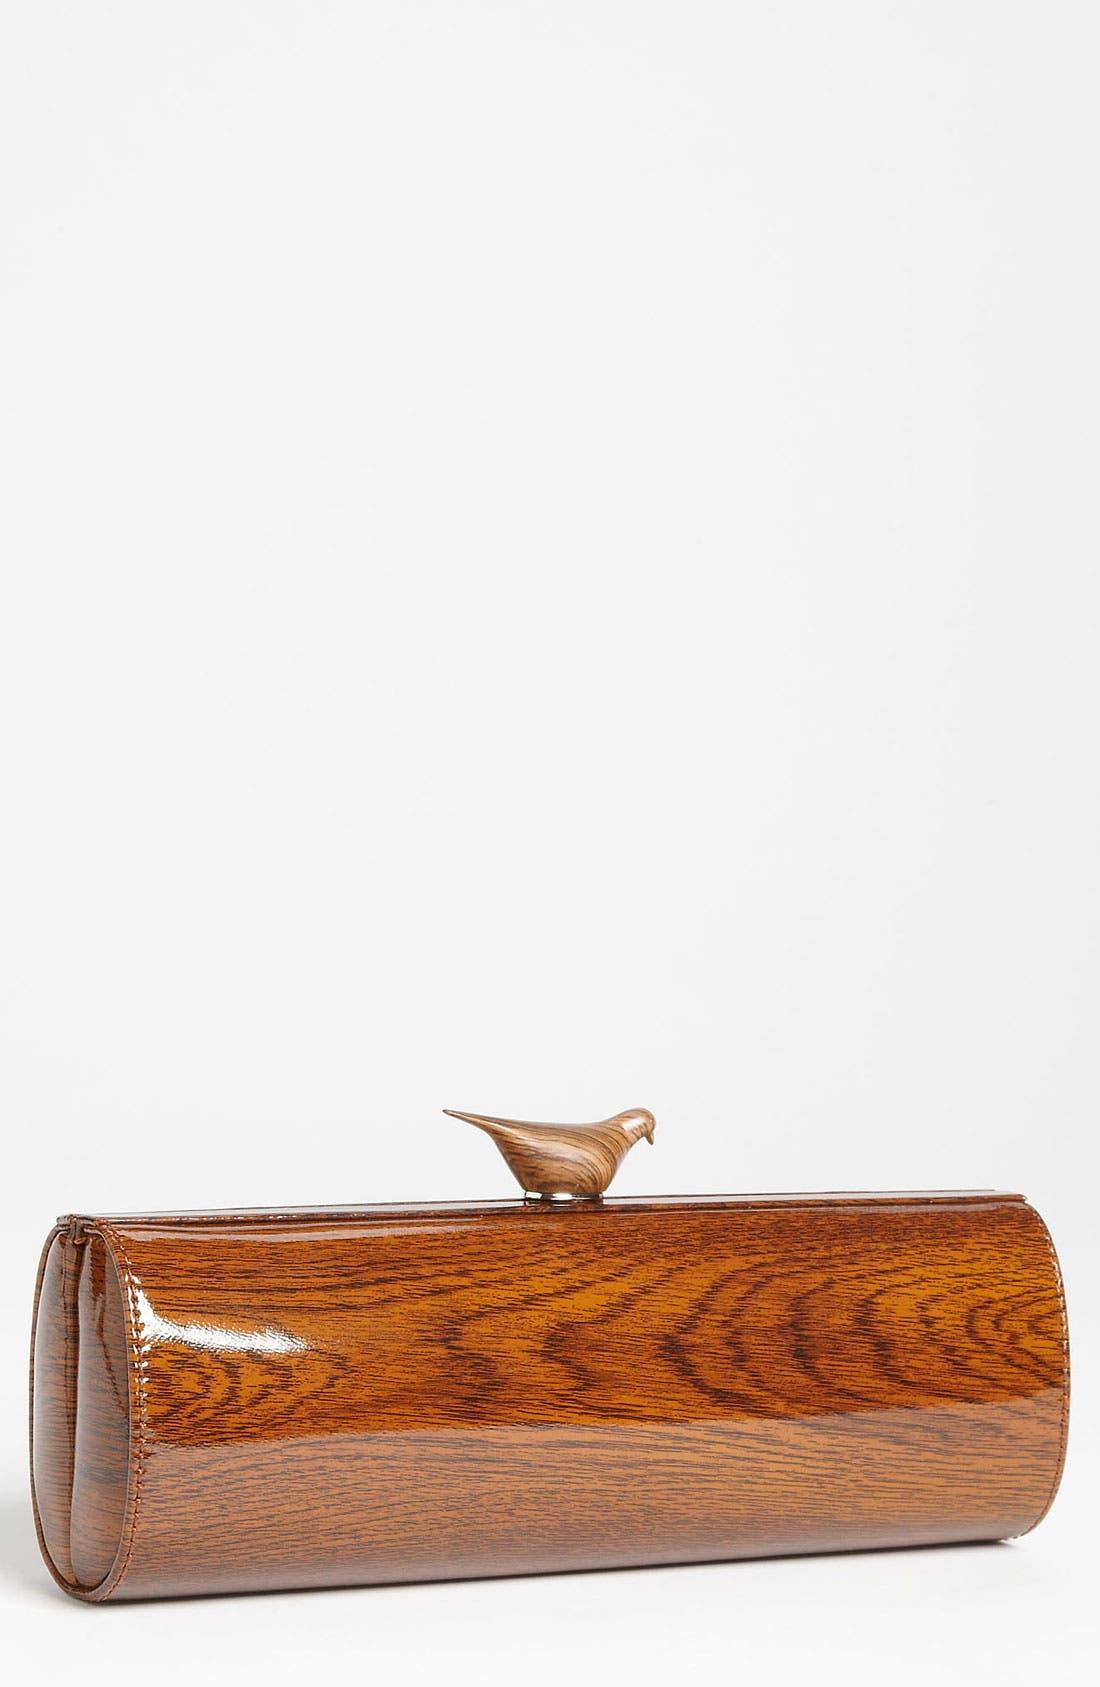 Alternate Image 1 Selected - kate spade new york 'knock on wood - woodpecker' clutch